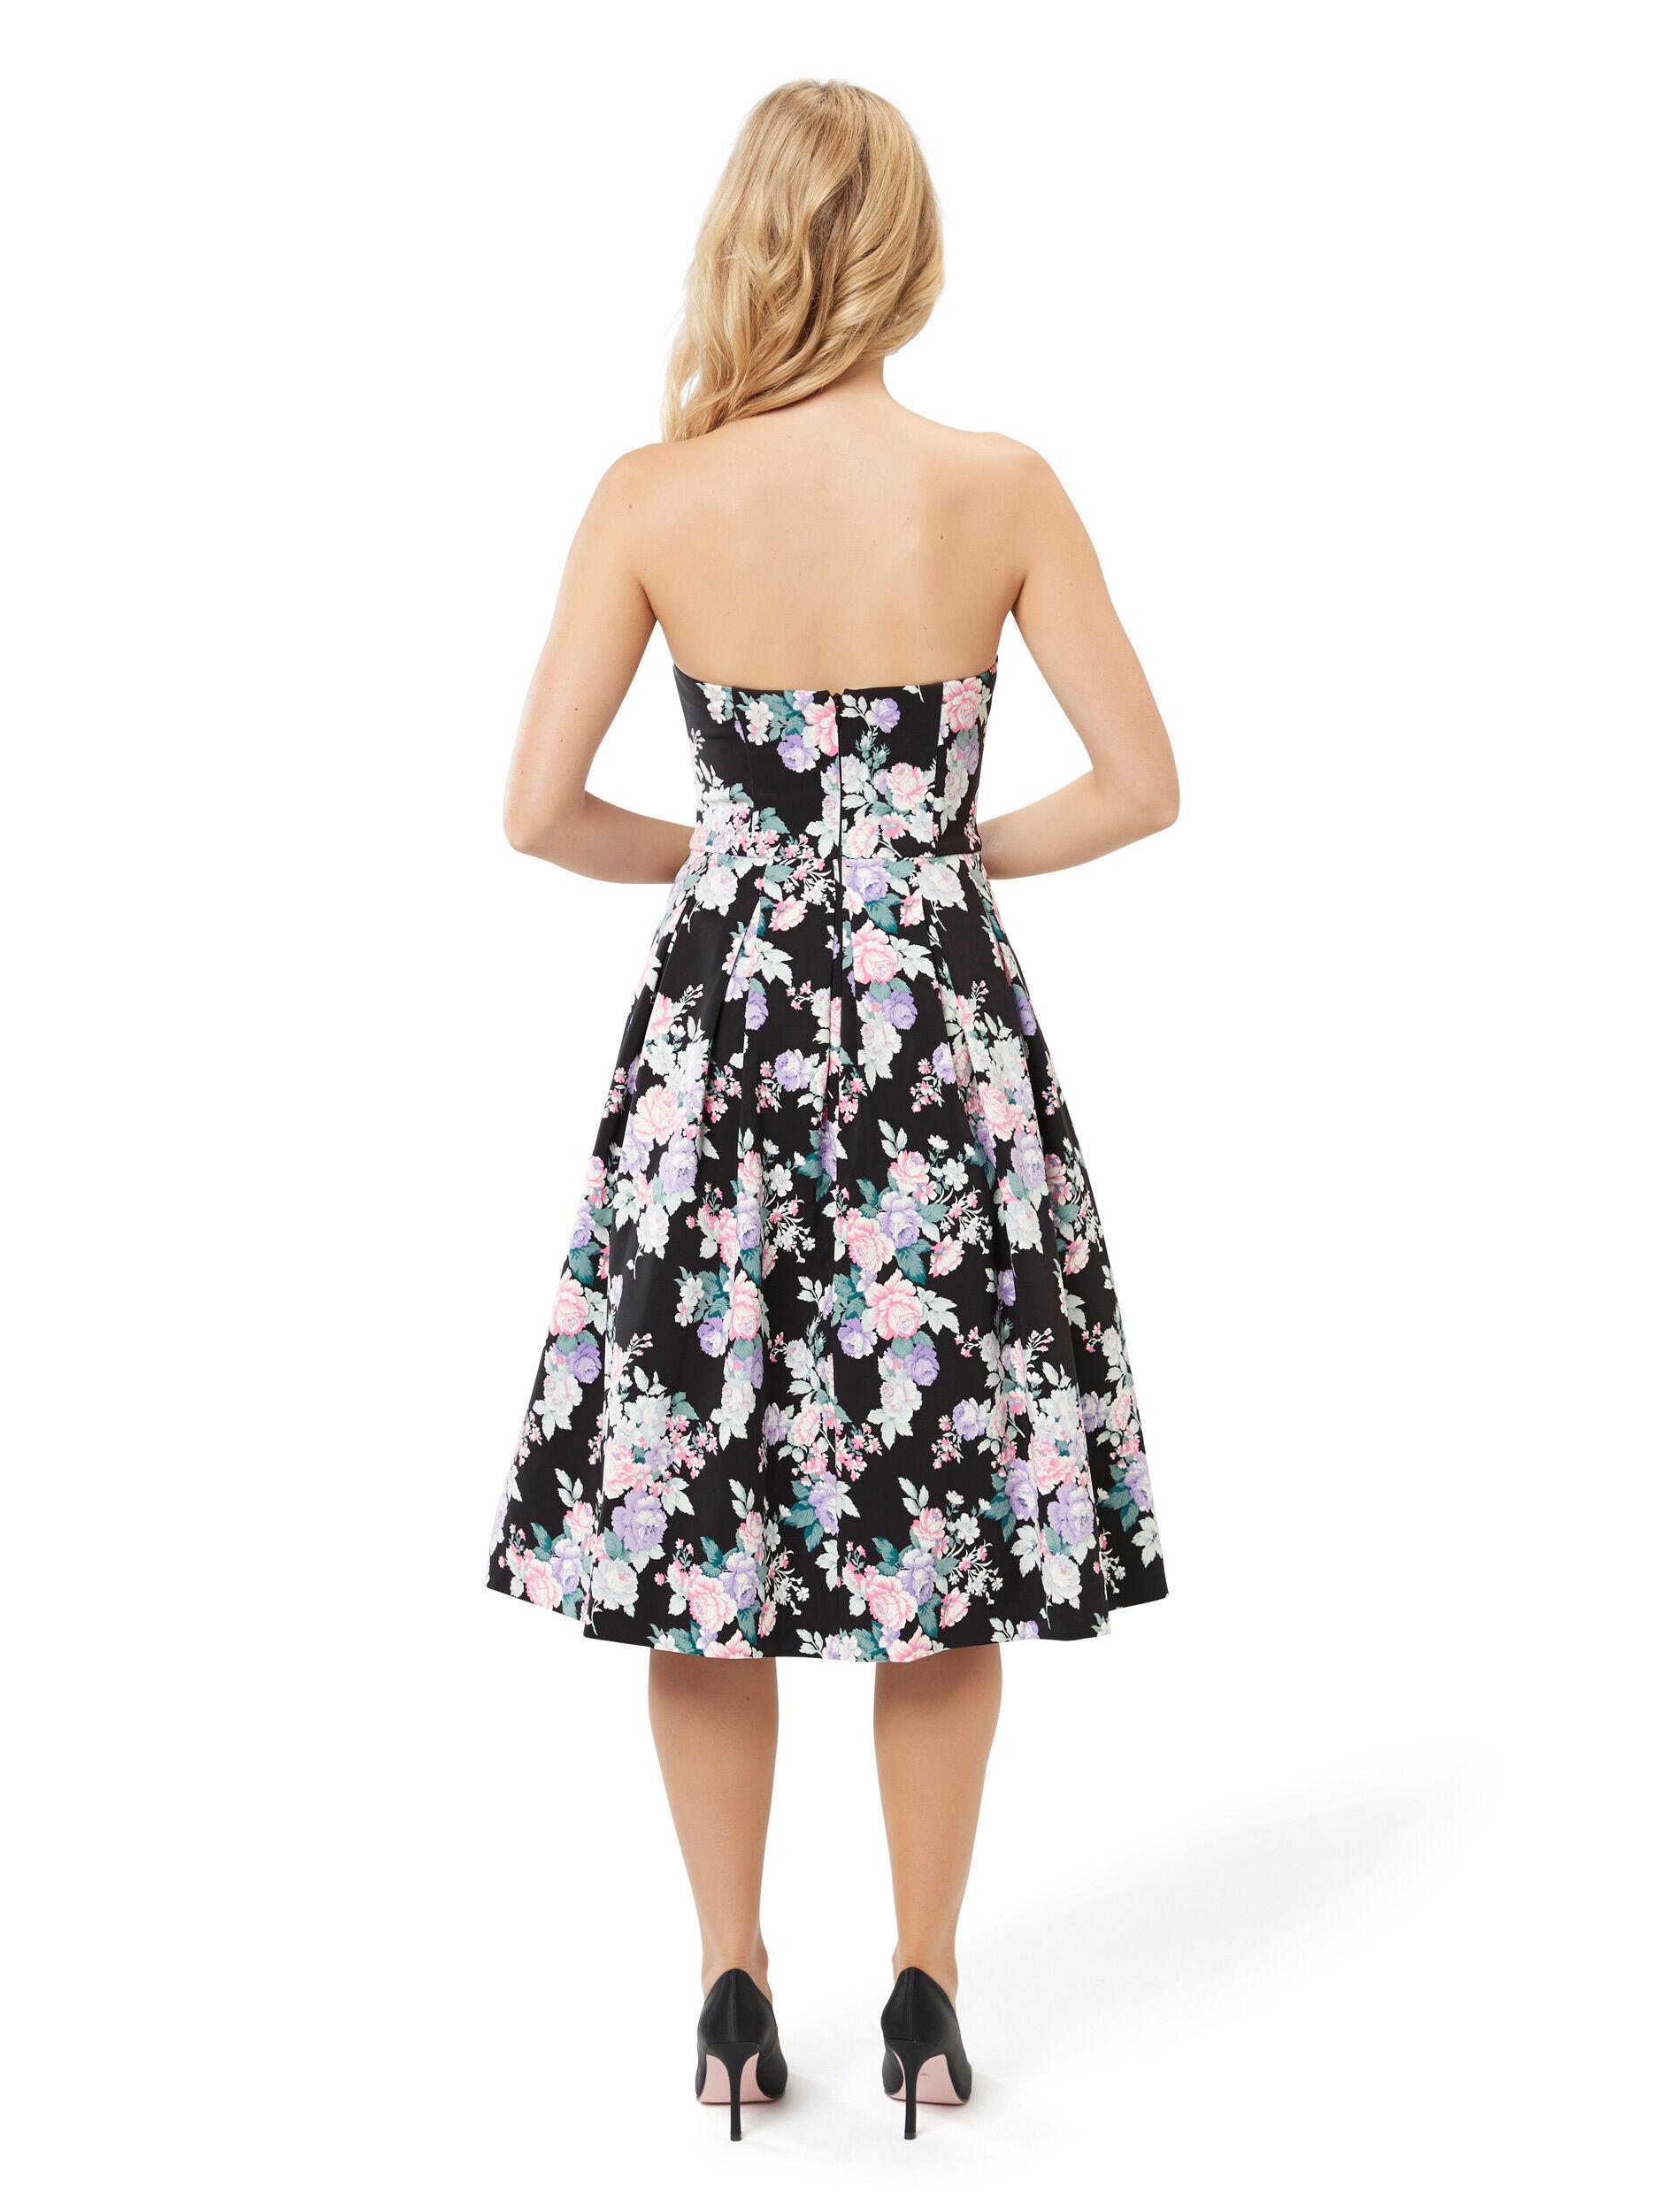 Lady Lavender Dress